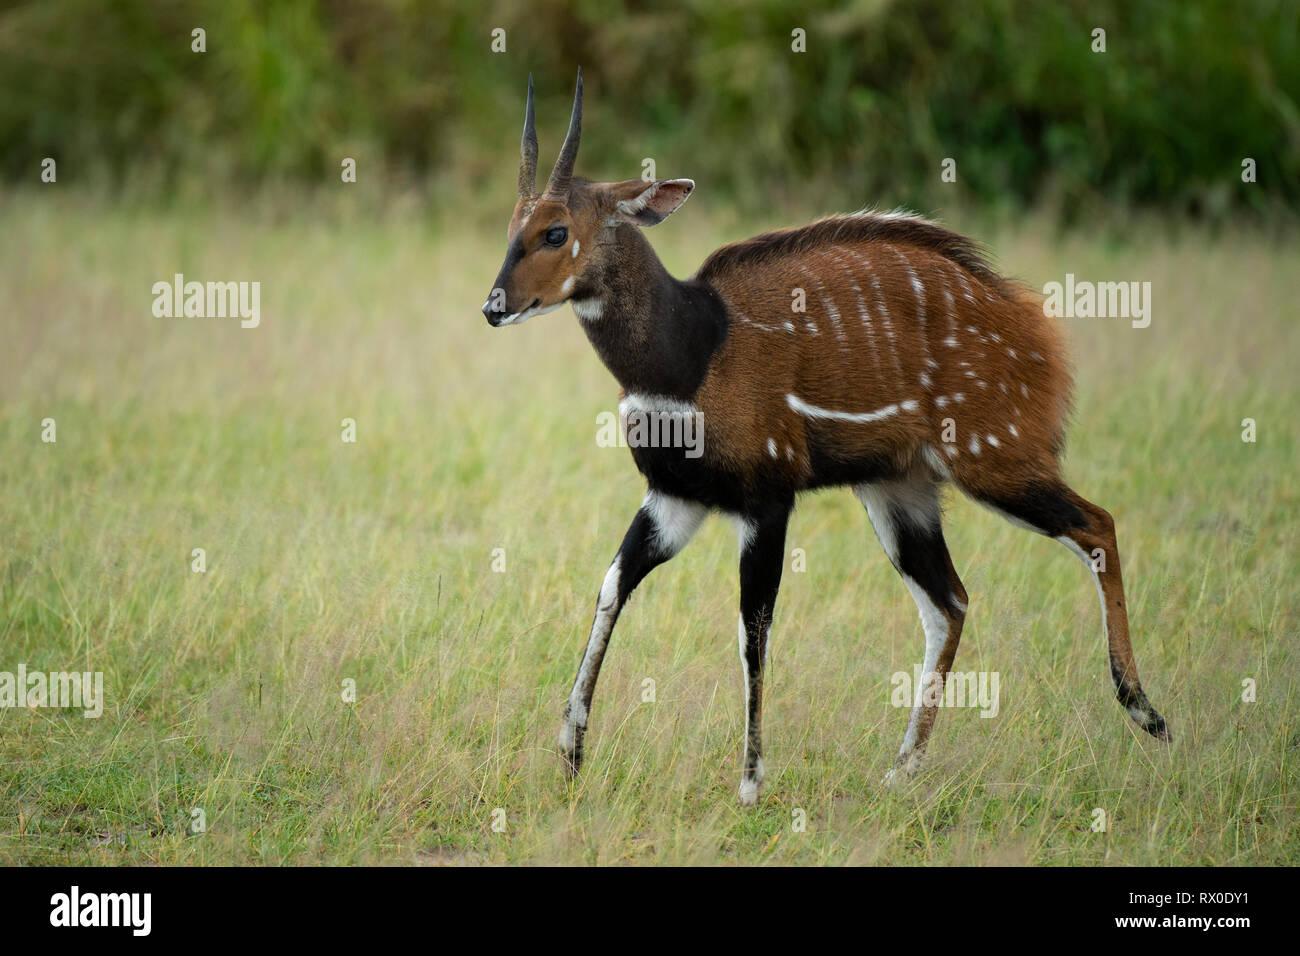 Intimidation display of a male bushbuck, Tragelaphus scriptus, Murchison Falls National Park, Uganda - Stock Image